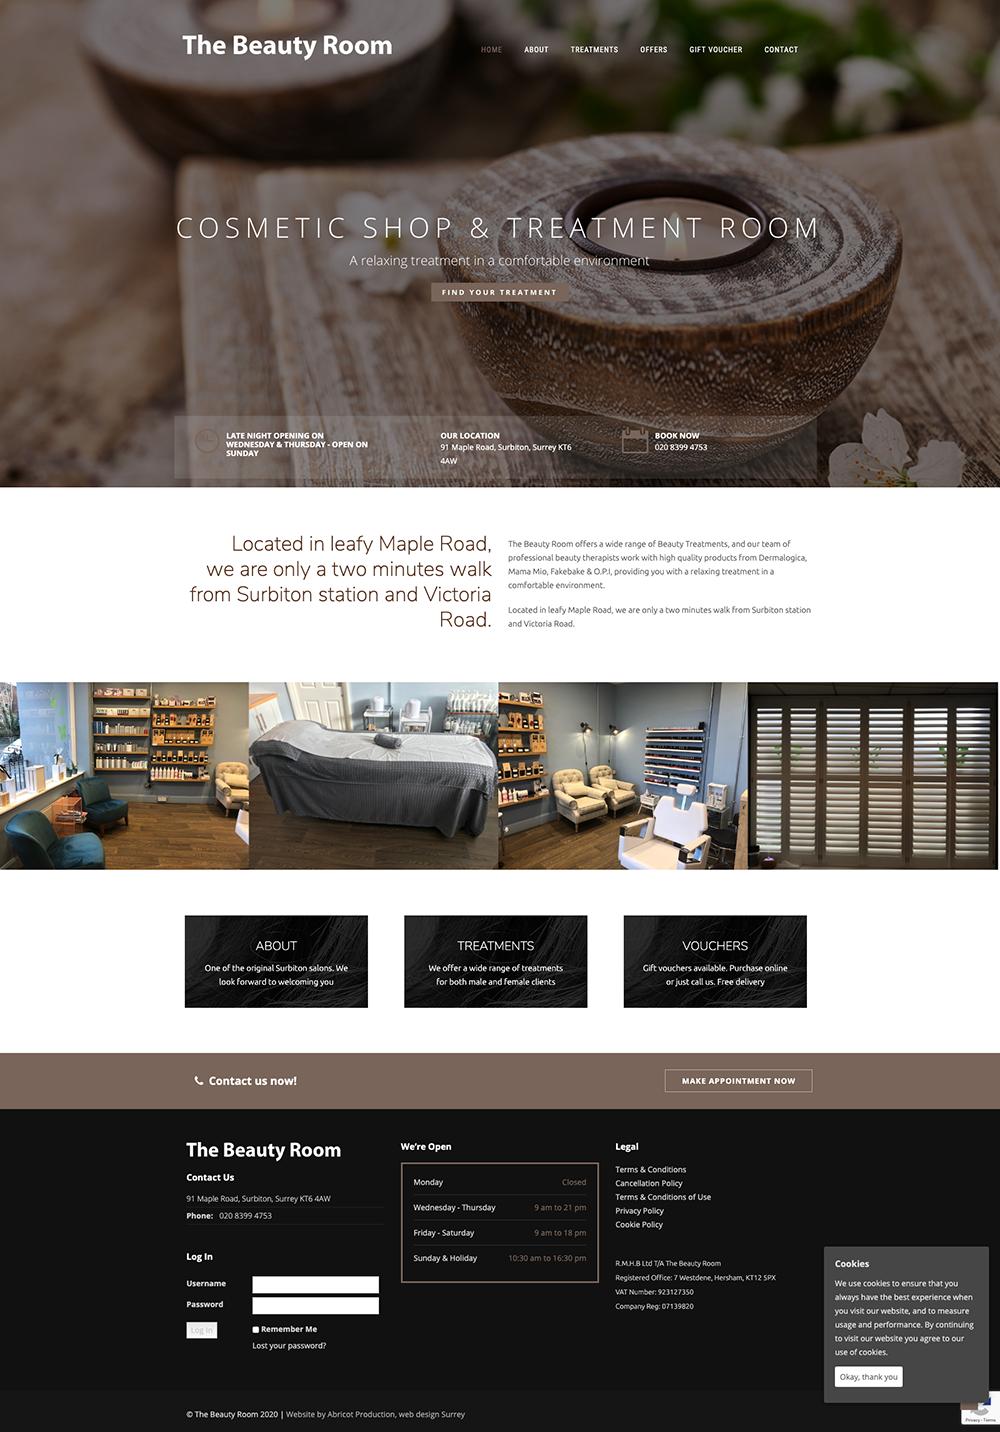 The Beauty Room website